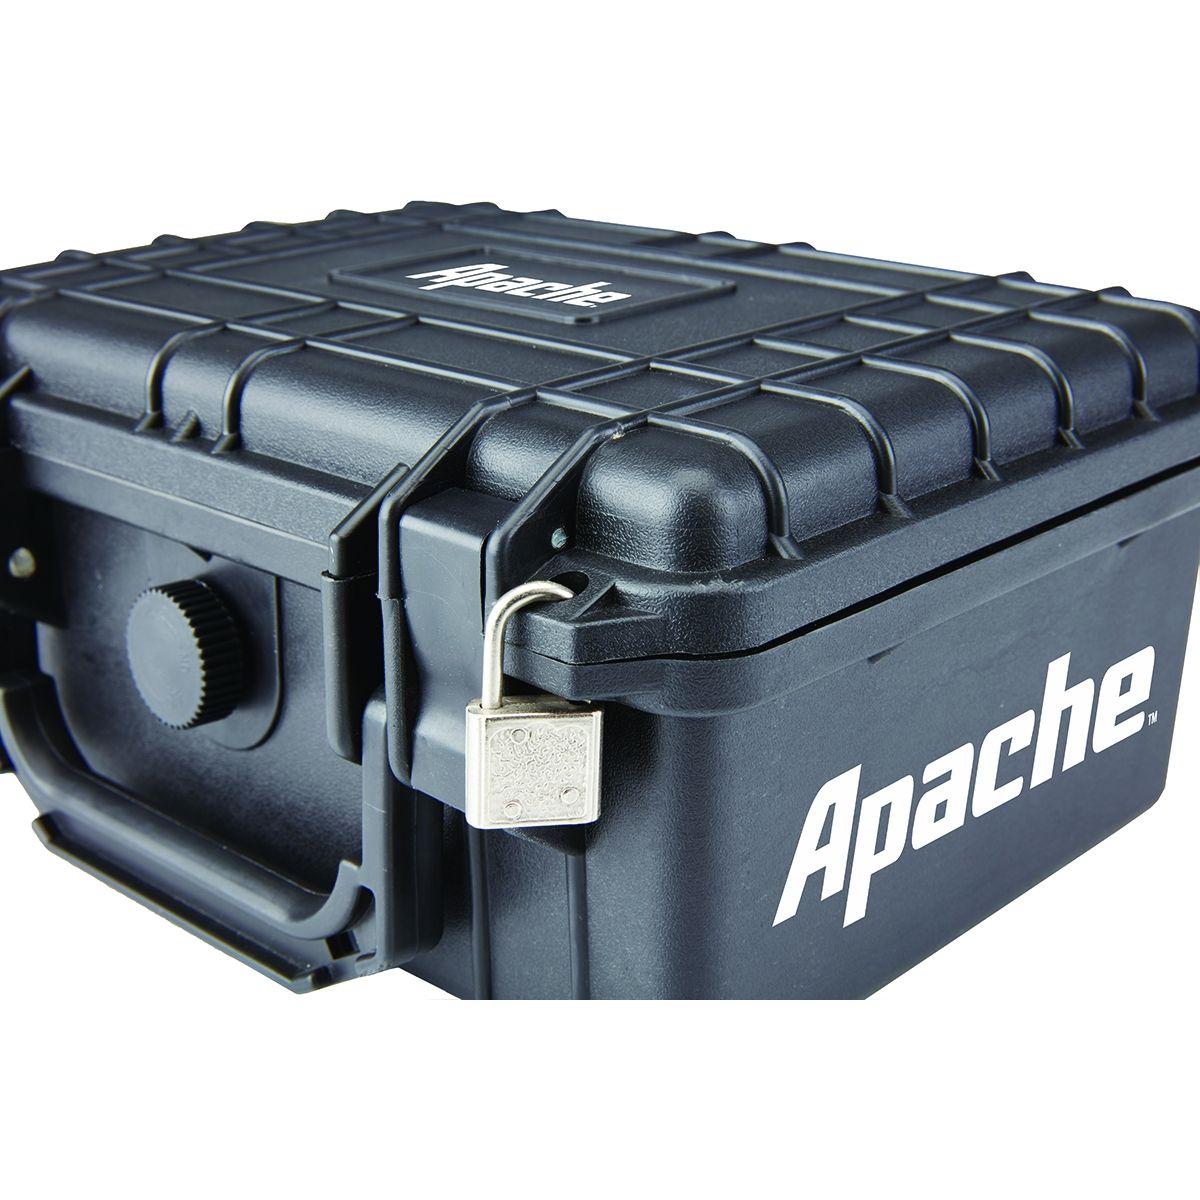 Apache Watertight Protective Hardcase